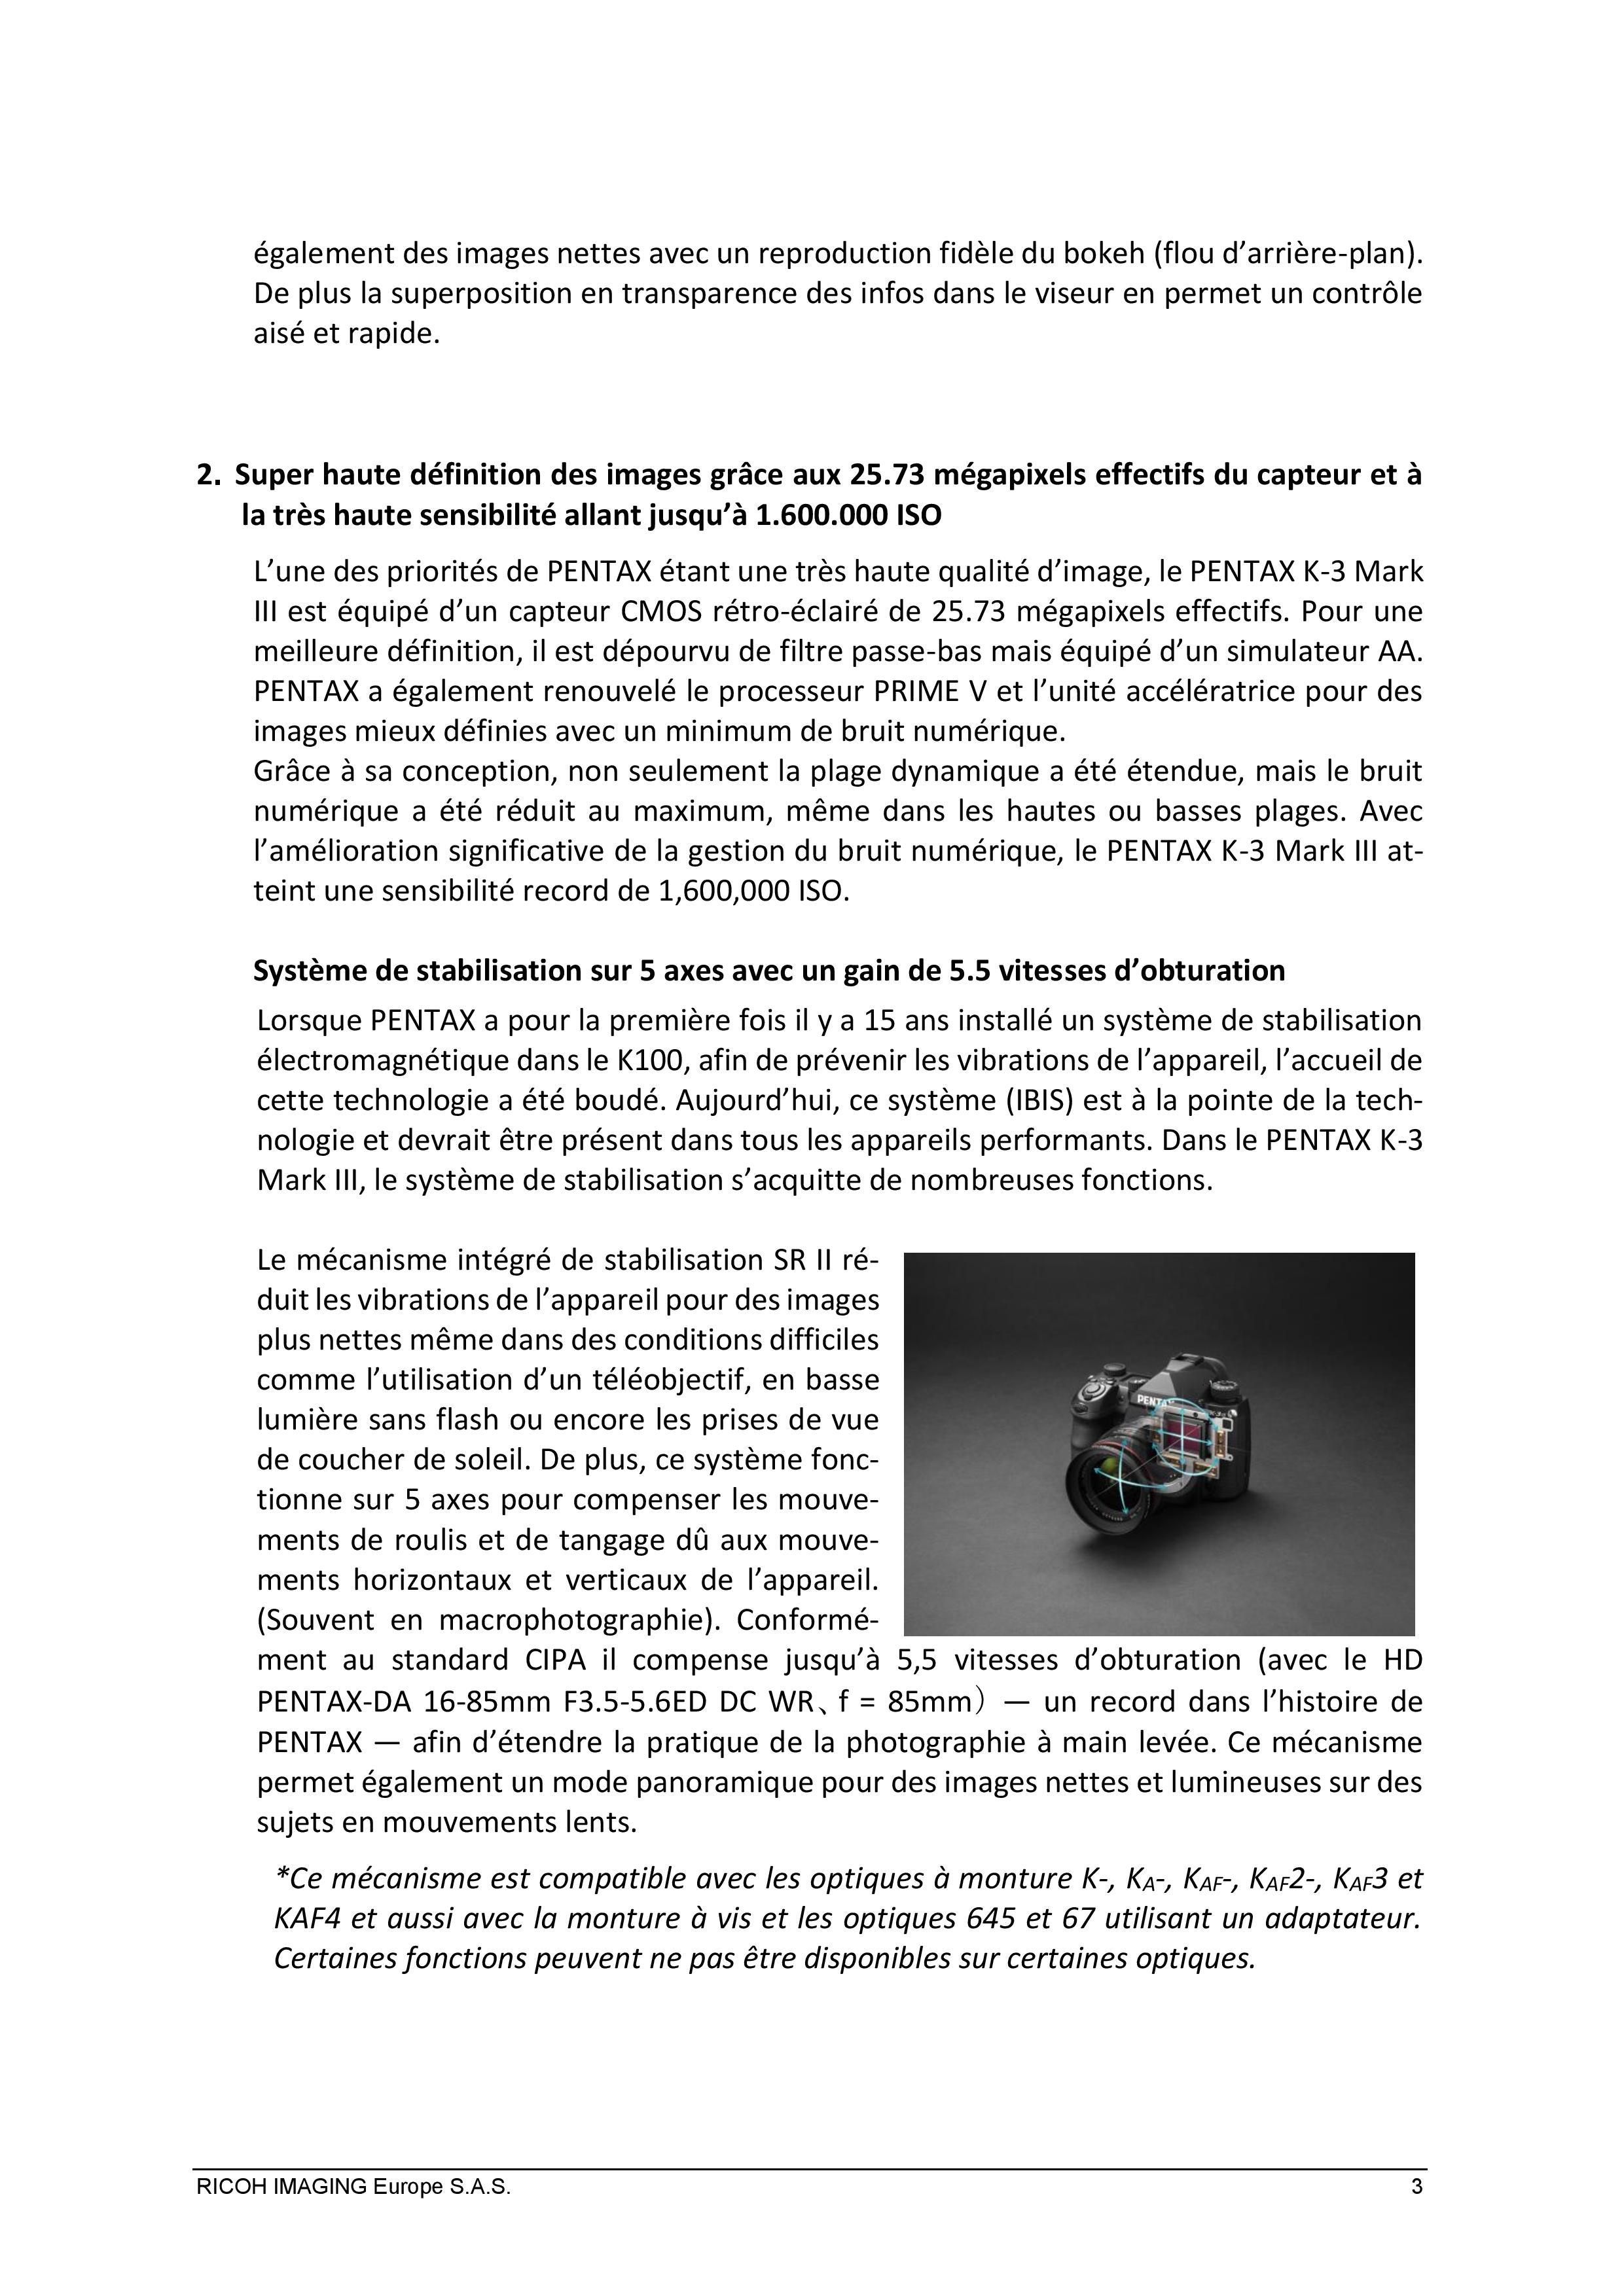 PENTAX RICOH IMAGING - Communiqué de presse du K3 Mark III 21033103135723142217344184